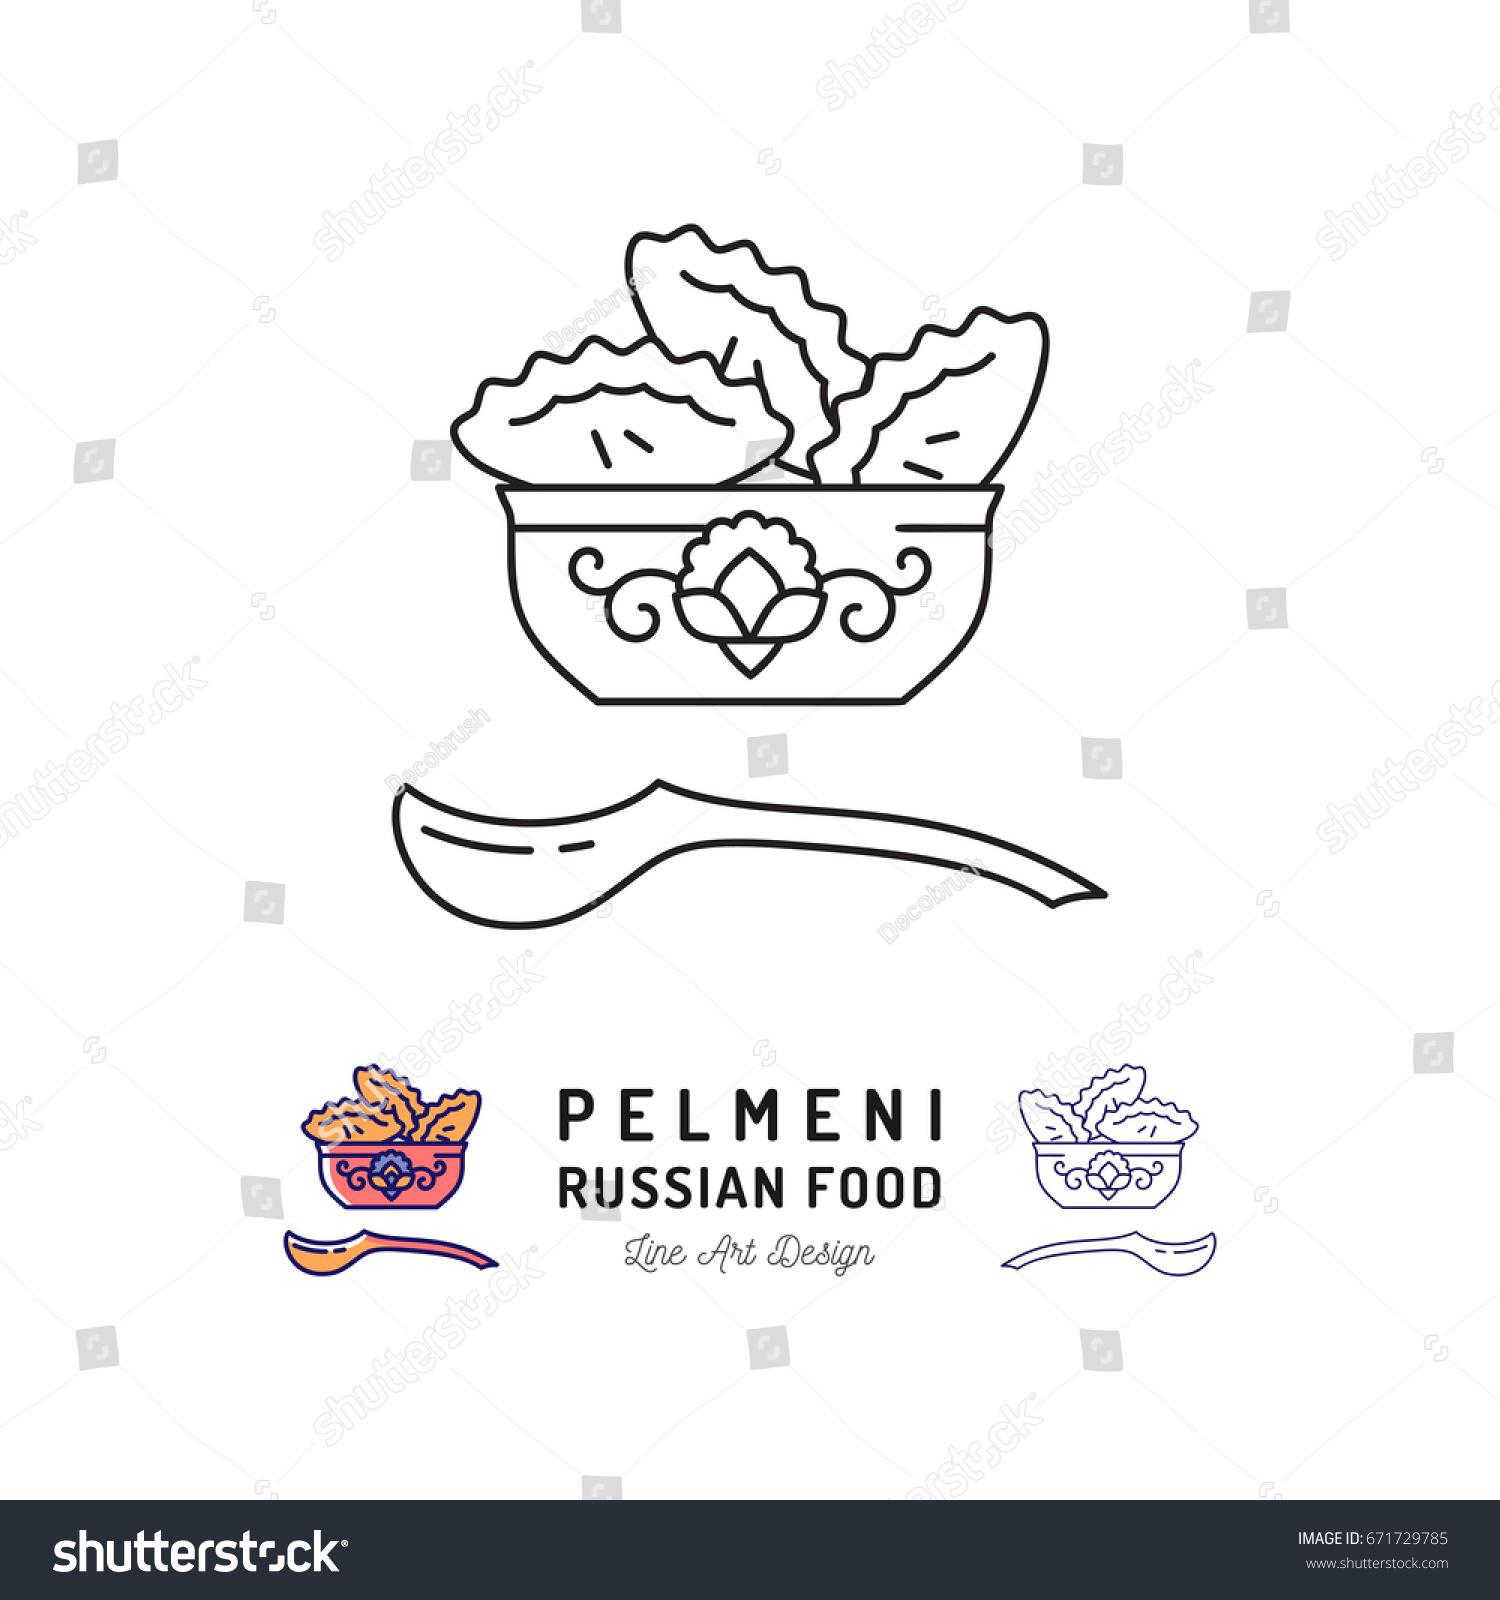 Dumpling icon pelmeni russian food symbol stock vector for Art of russian cuisine